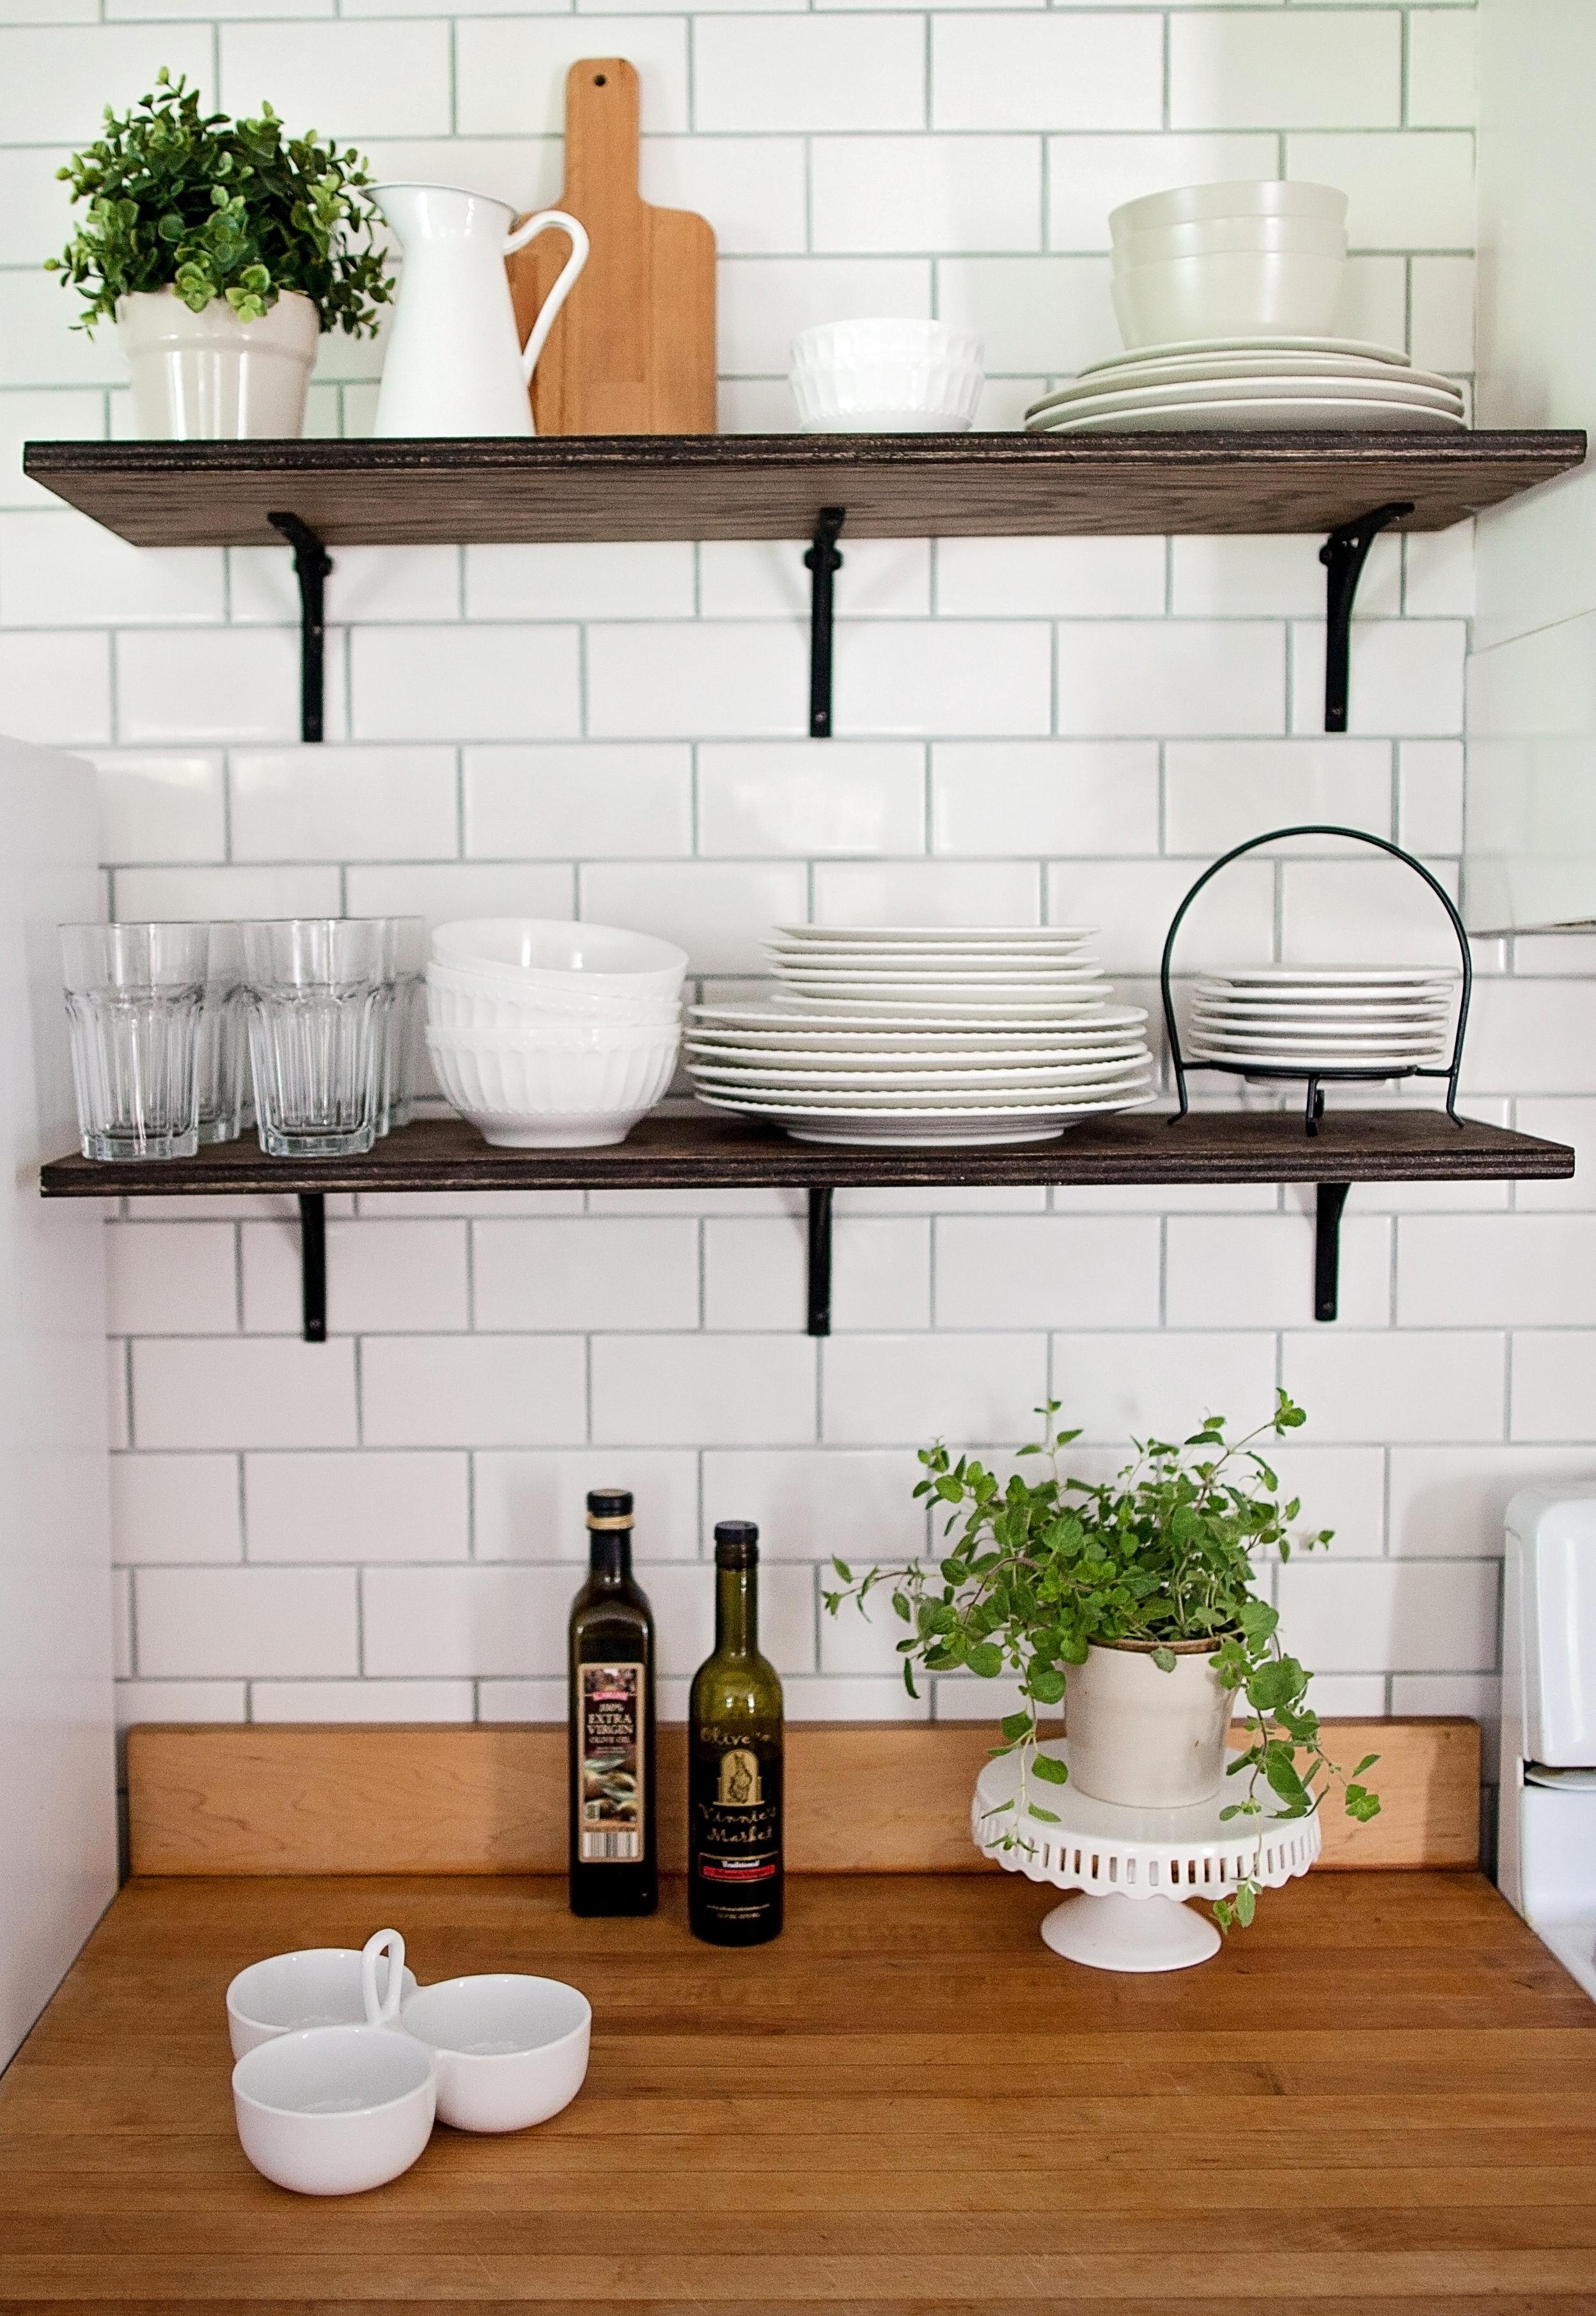 Farmhouse Kitchen Open Shelving- Laura Design Co.